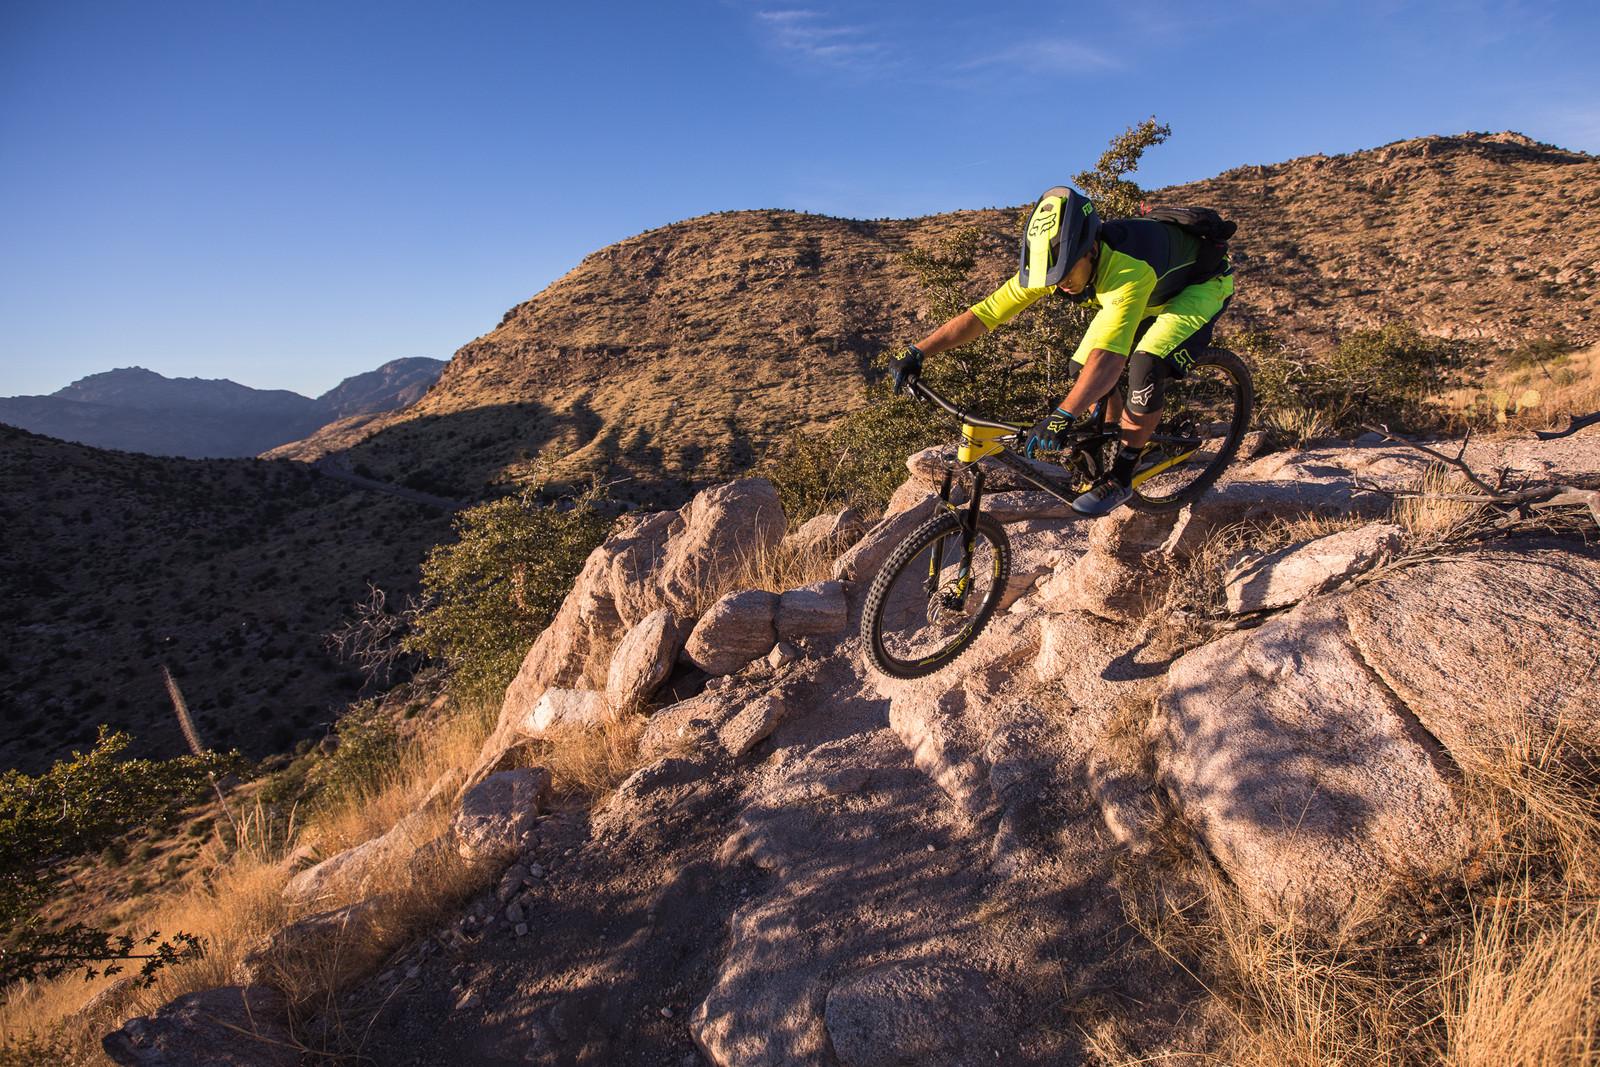 Rocky Mountain Slayer 770 MSL - 2017 Vital MTB Test Sessions - Rocky Mountain Slayer 770 MSL - 2017 Vital MTB Test Sessions - Mountain Biking Pictures - Vital MTB